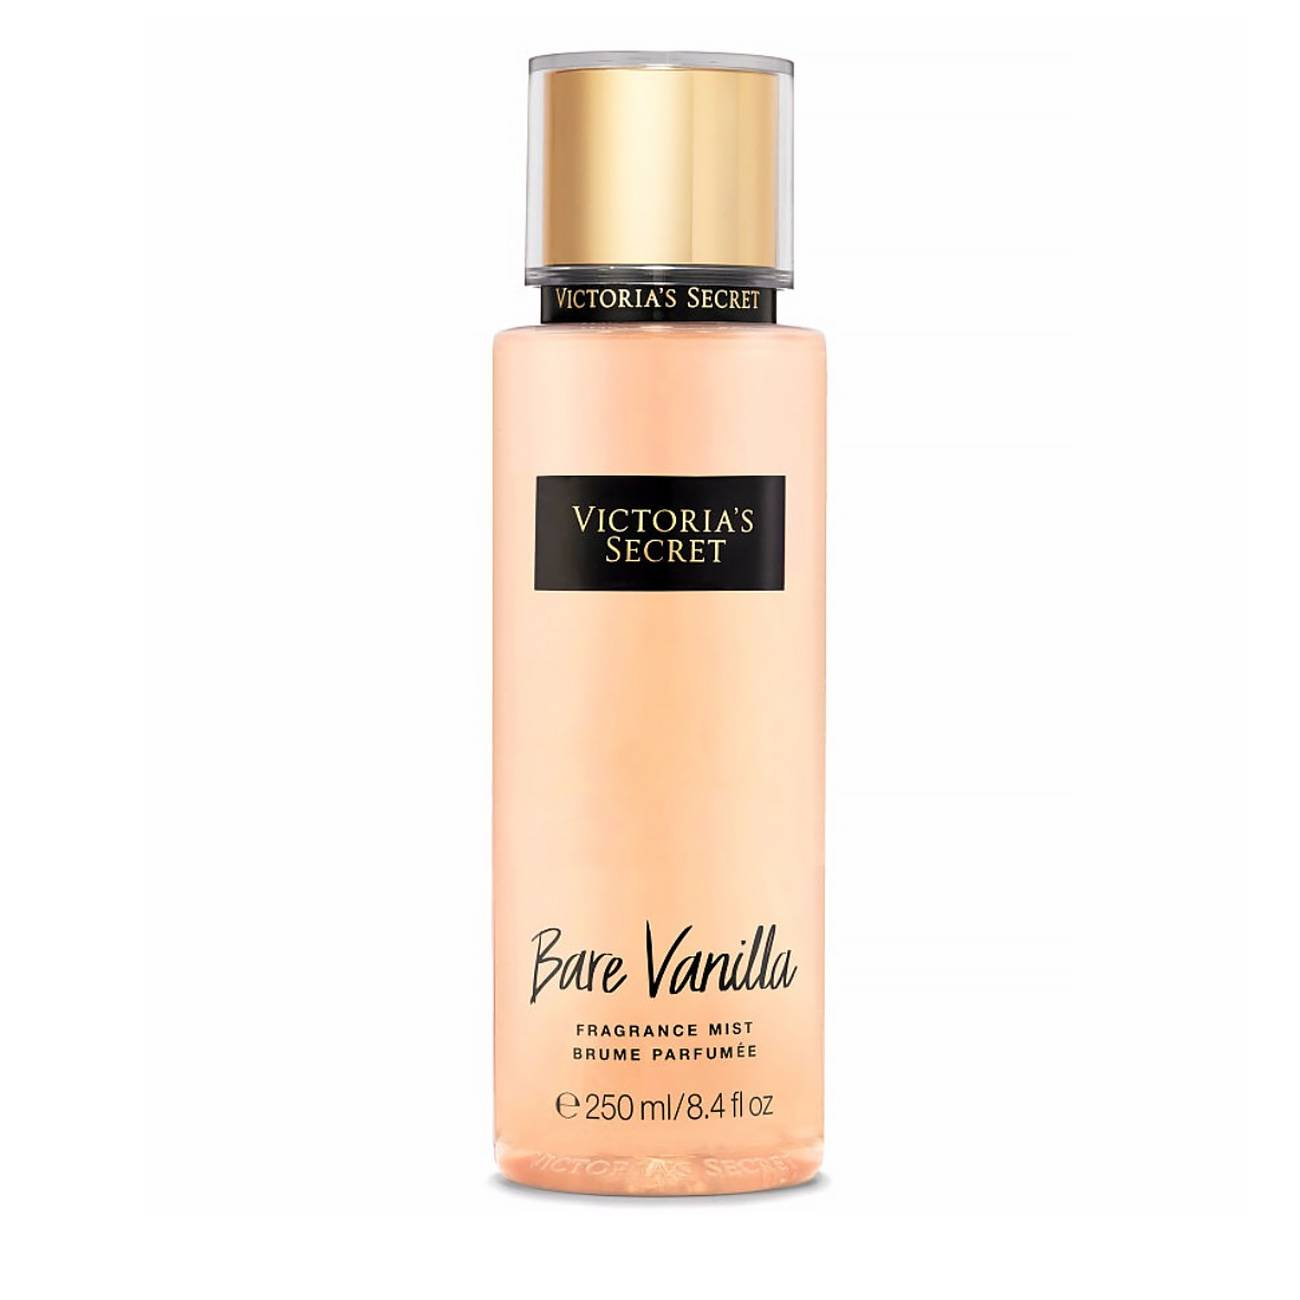 Bare Vanilla Mist 250ml Victoria's Secret imagine 2021 bestvalue.eu